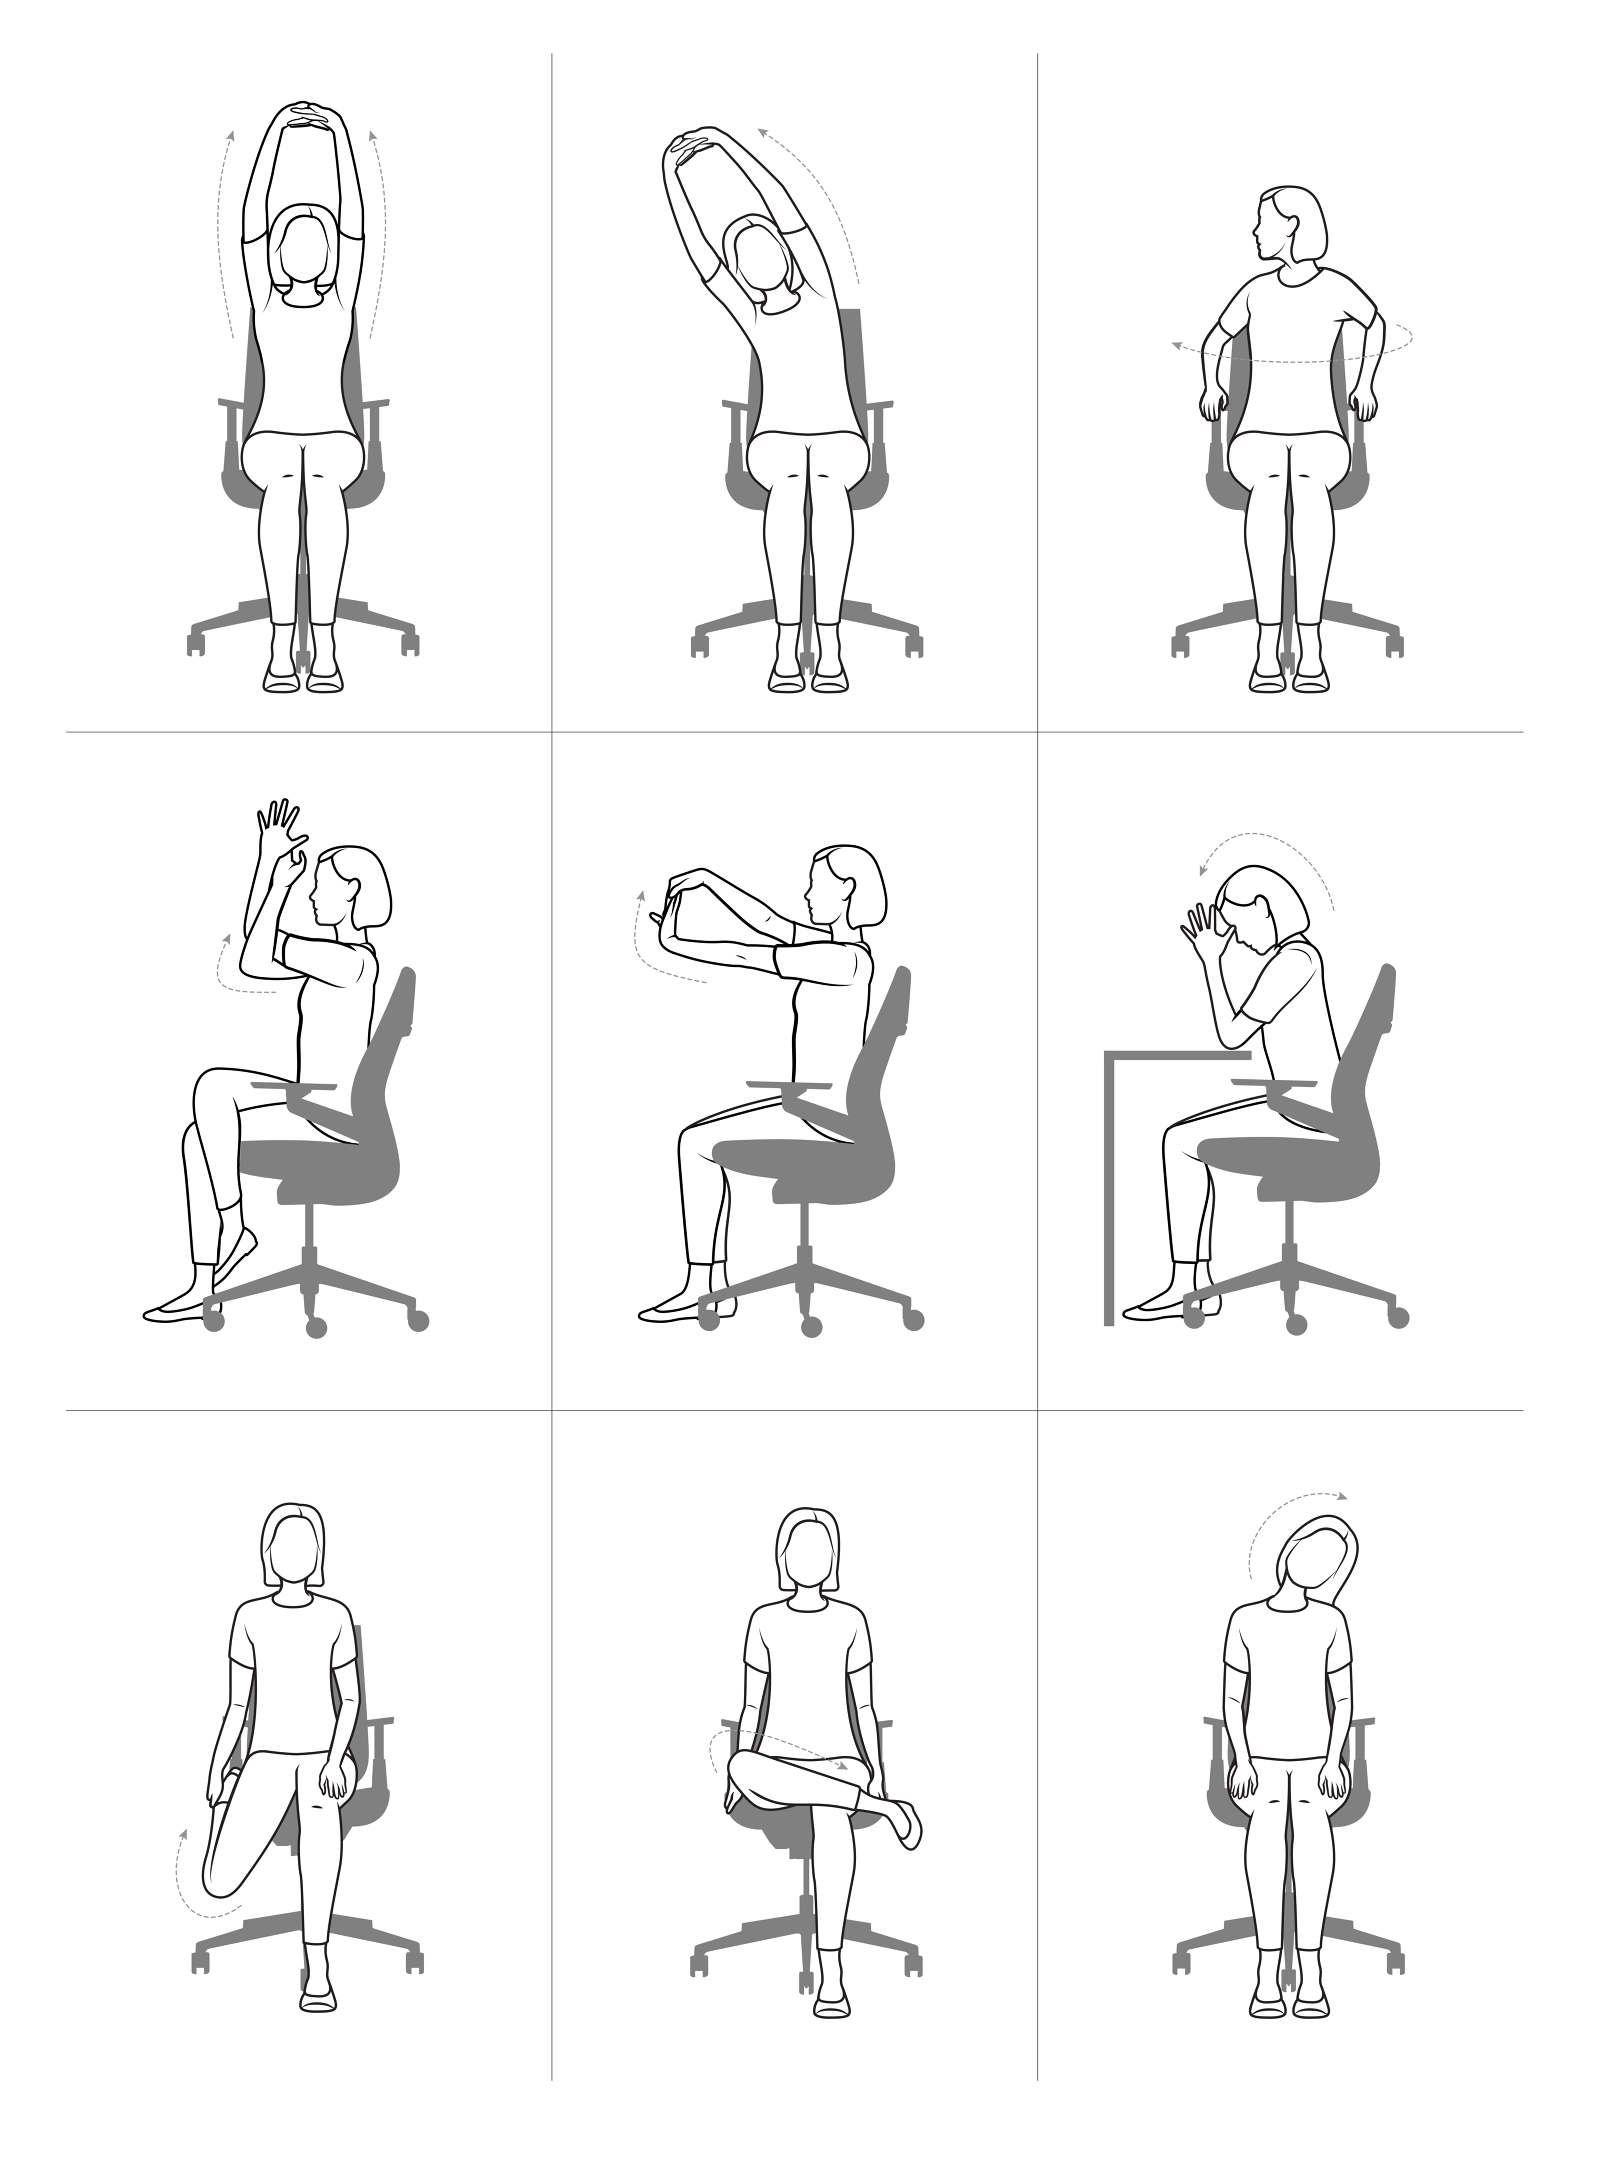 Instructional Illustrations Technical Illustrator